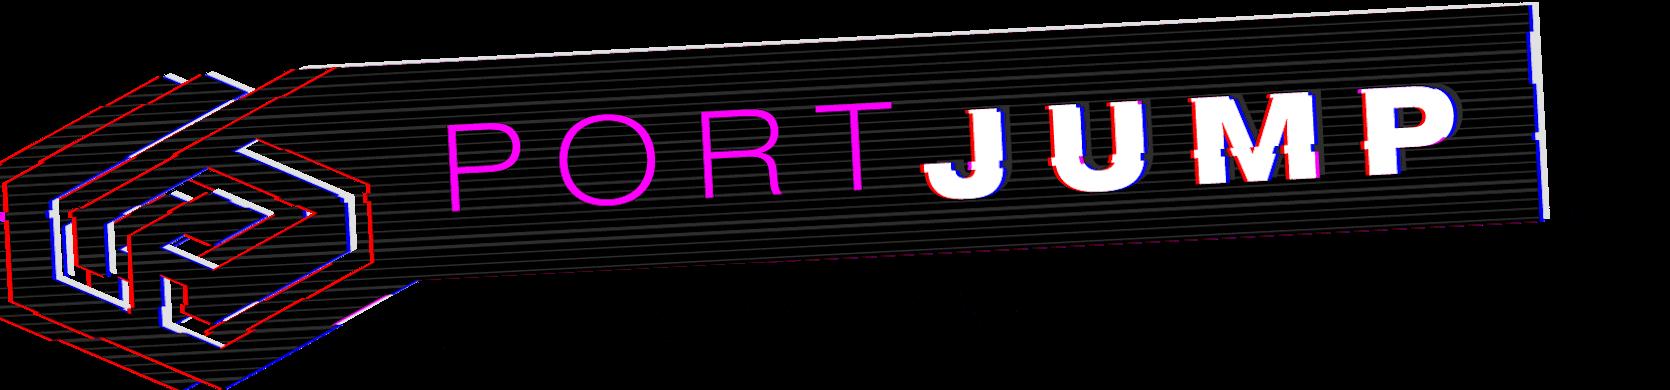 PortJump